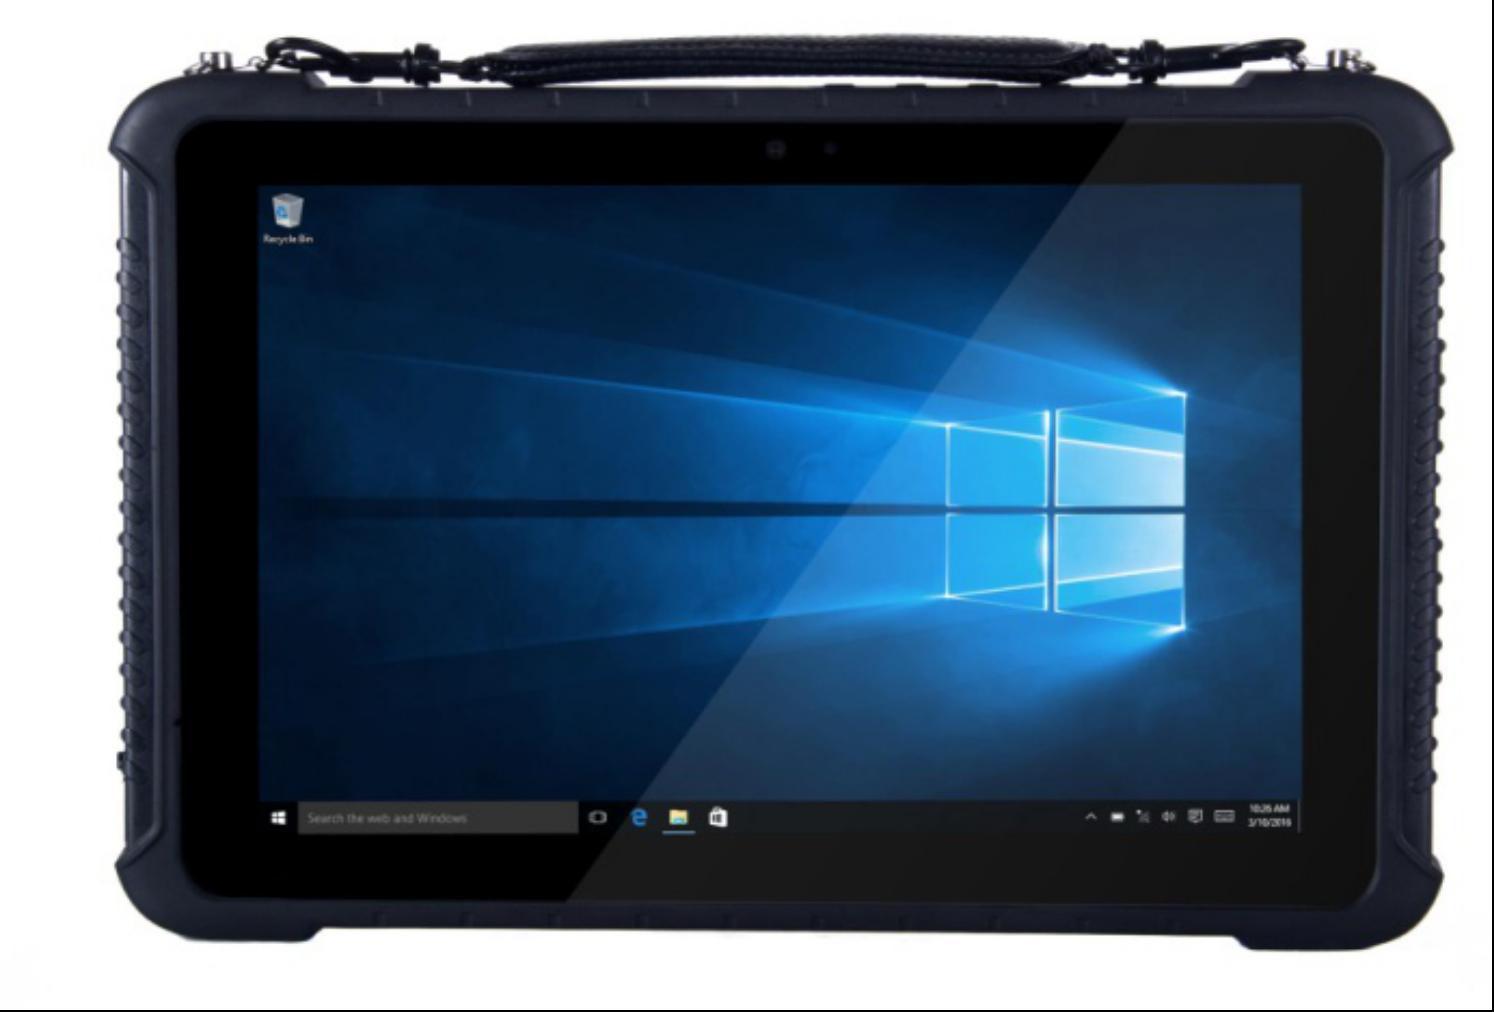 10.1 inch Industrial Windows Tablet RuggedT W1K